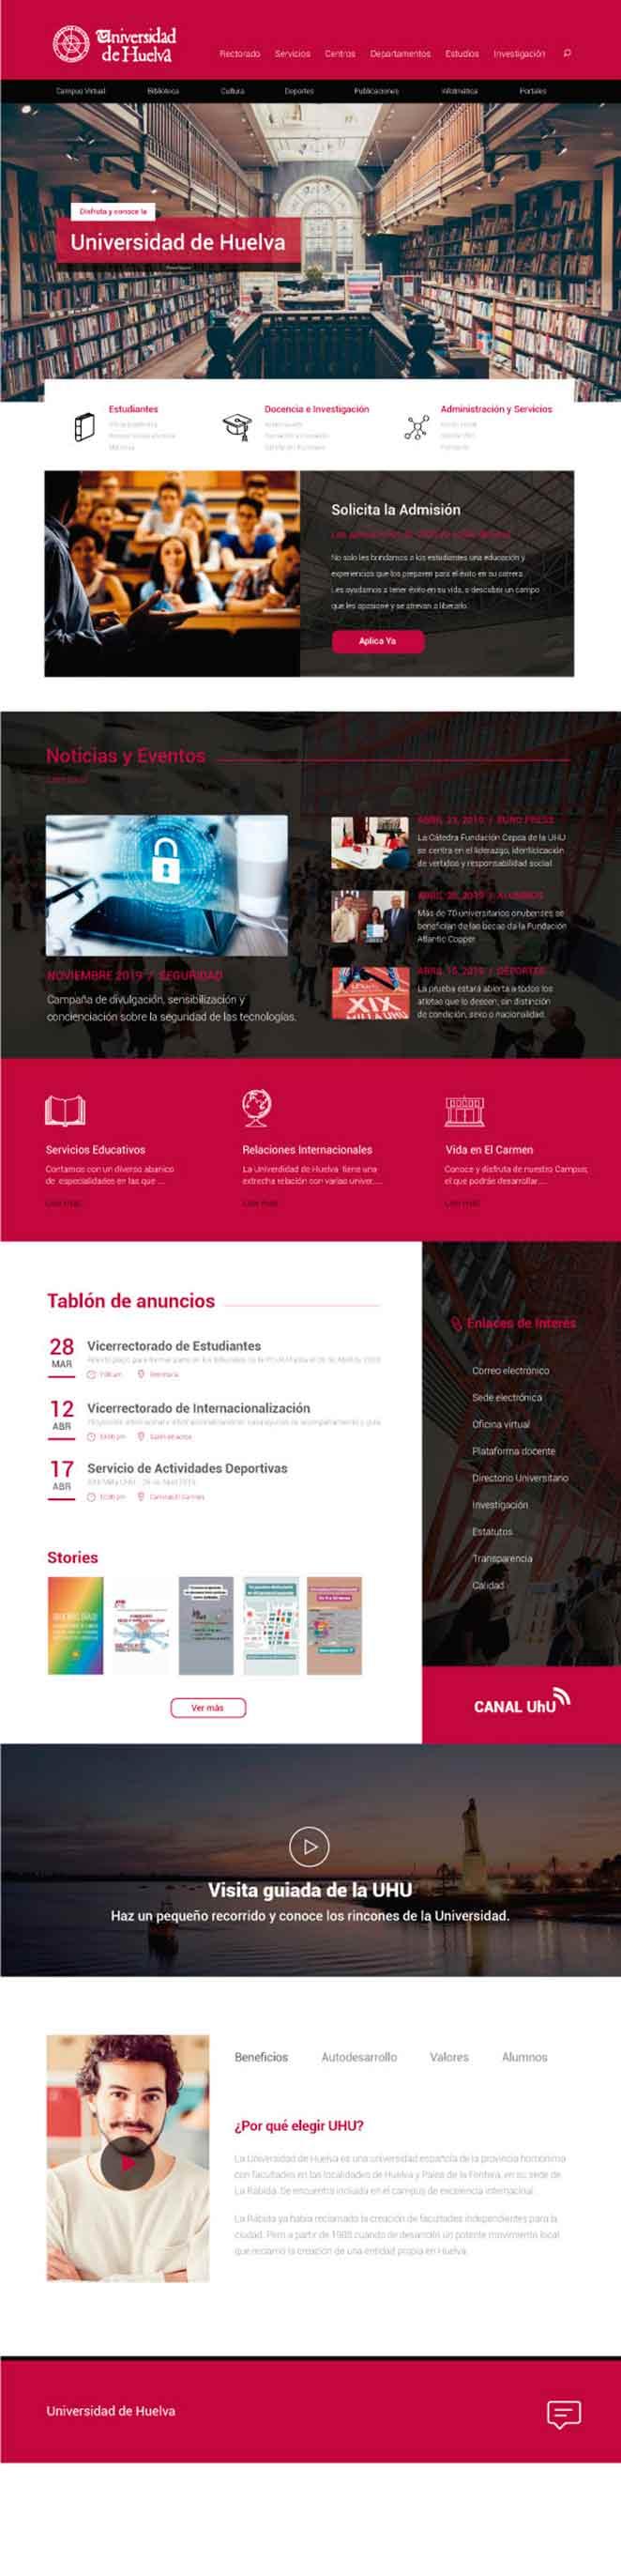 primera pagina web universidad de huelva